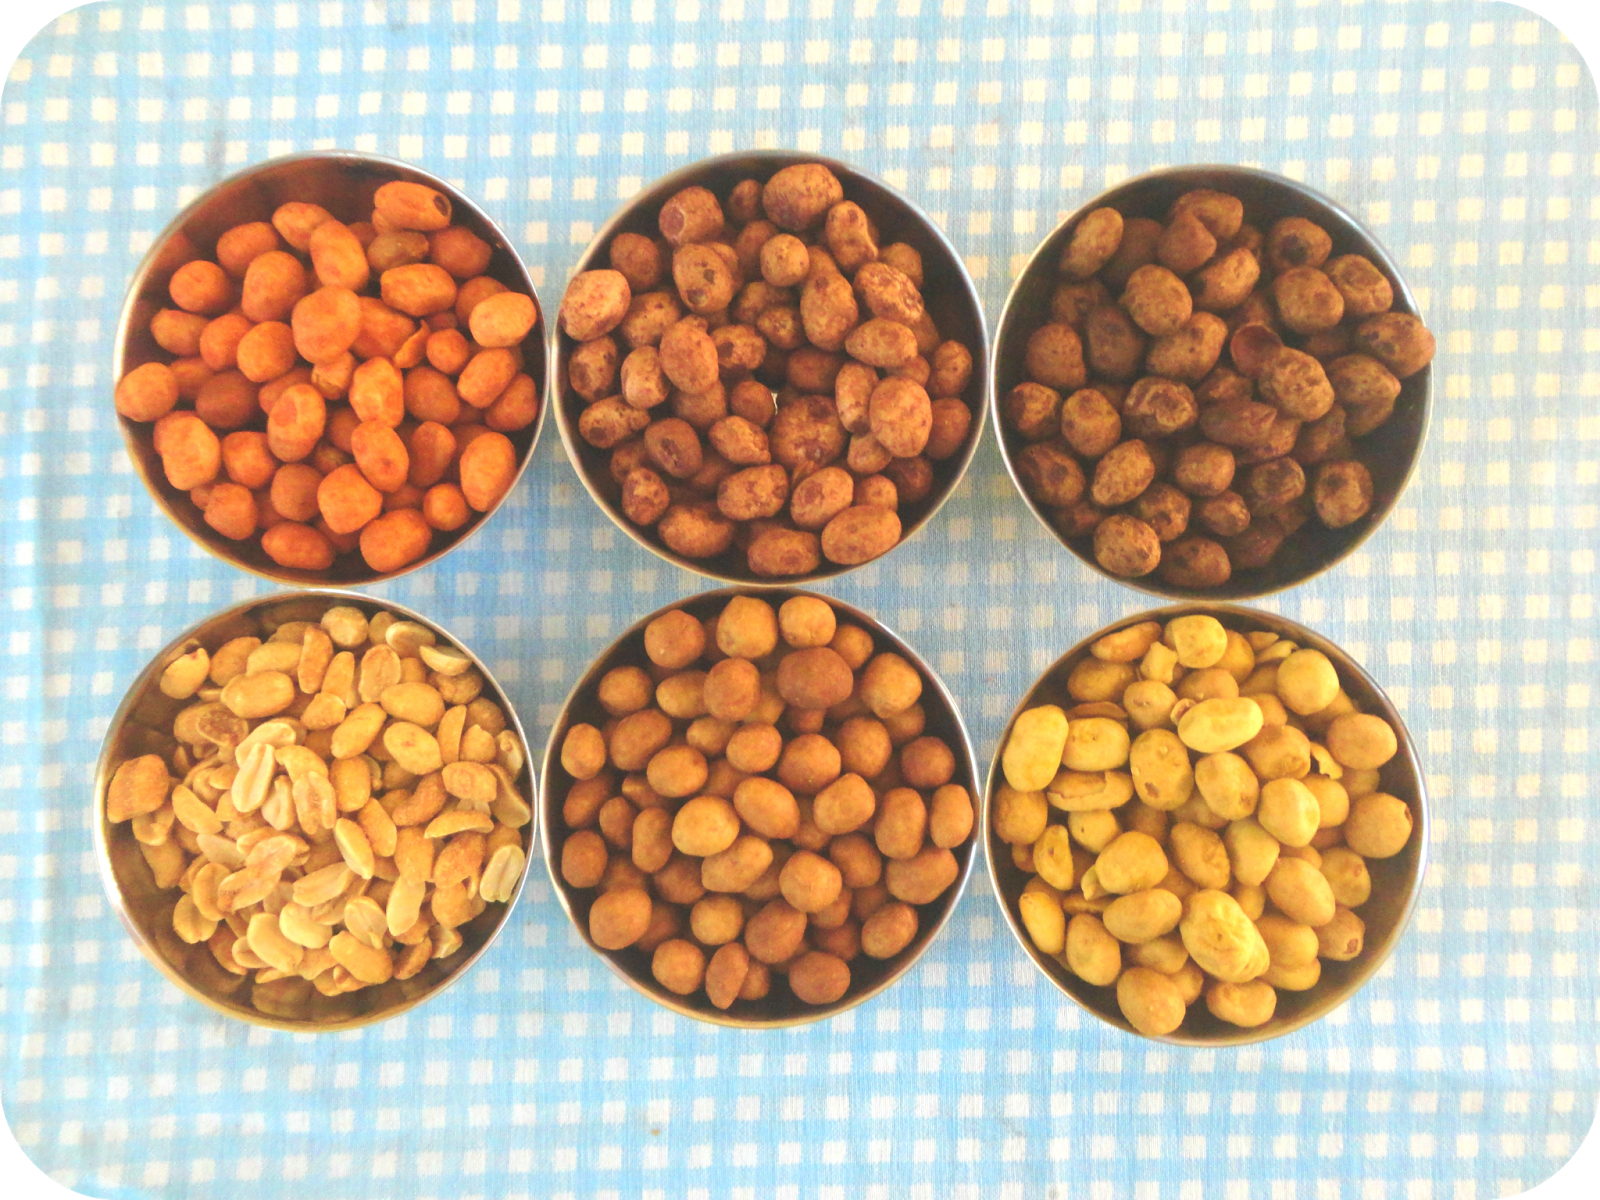 Dori Alimentos #DoriAlimentos   #BalasDori   #AmendoinsDori   #Dori